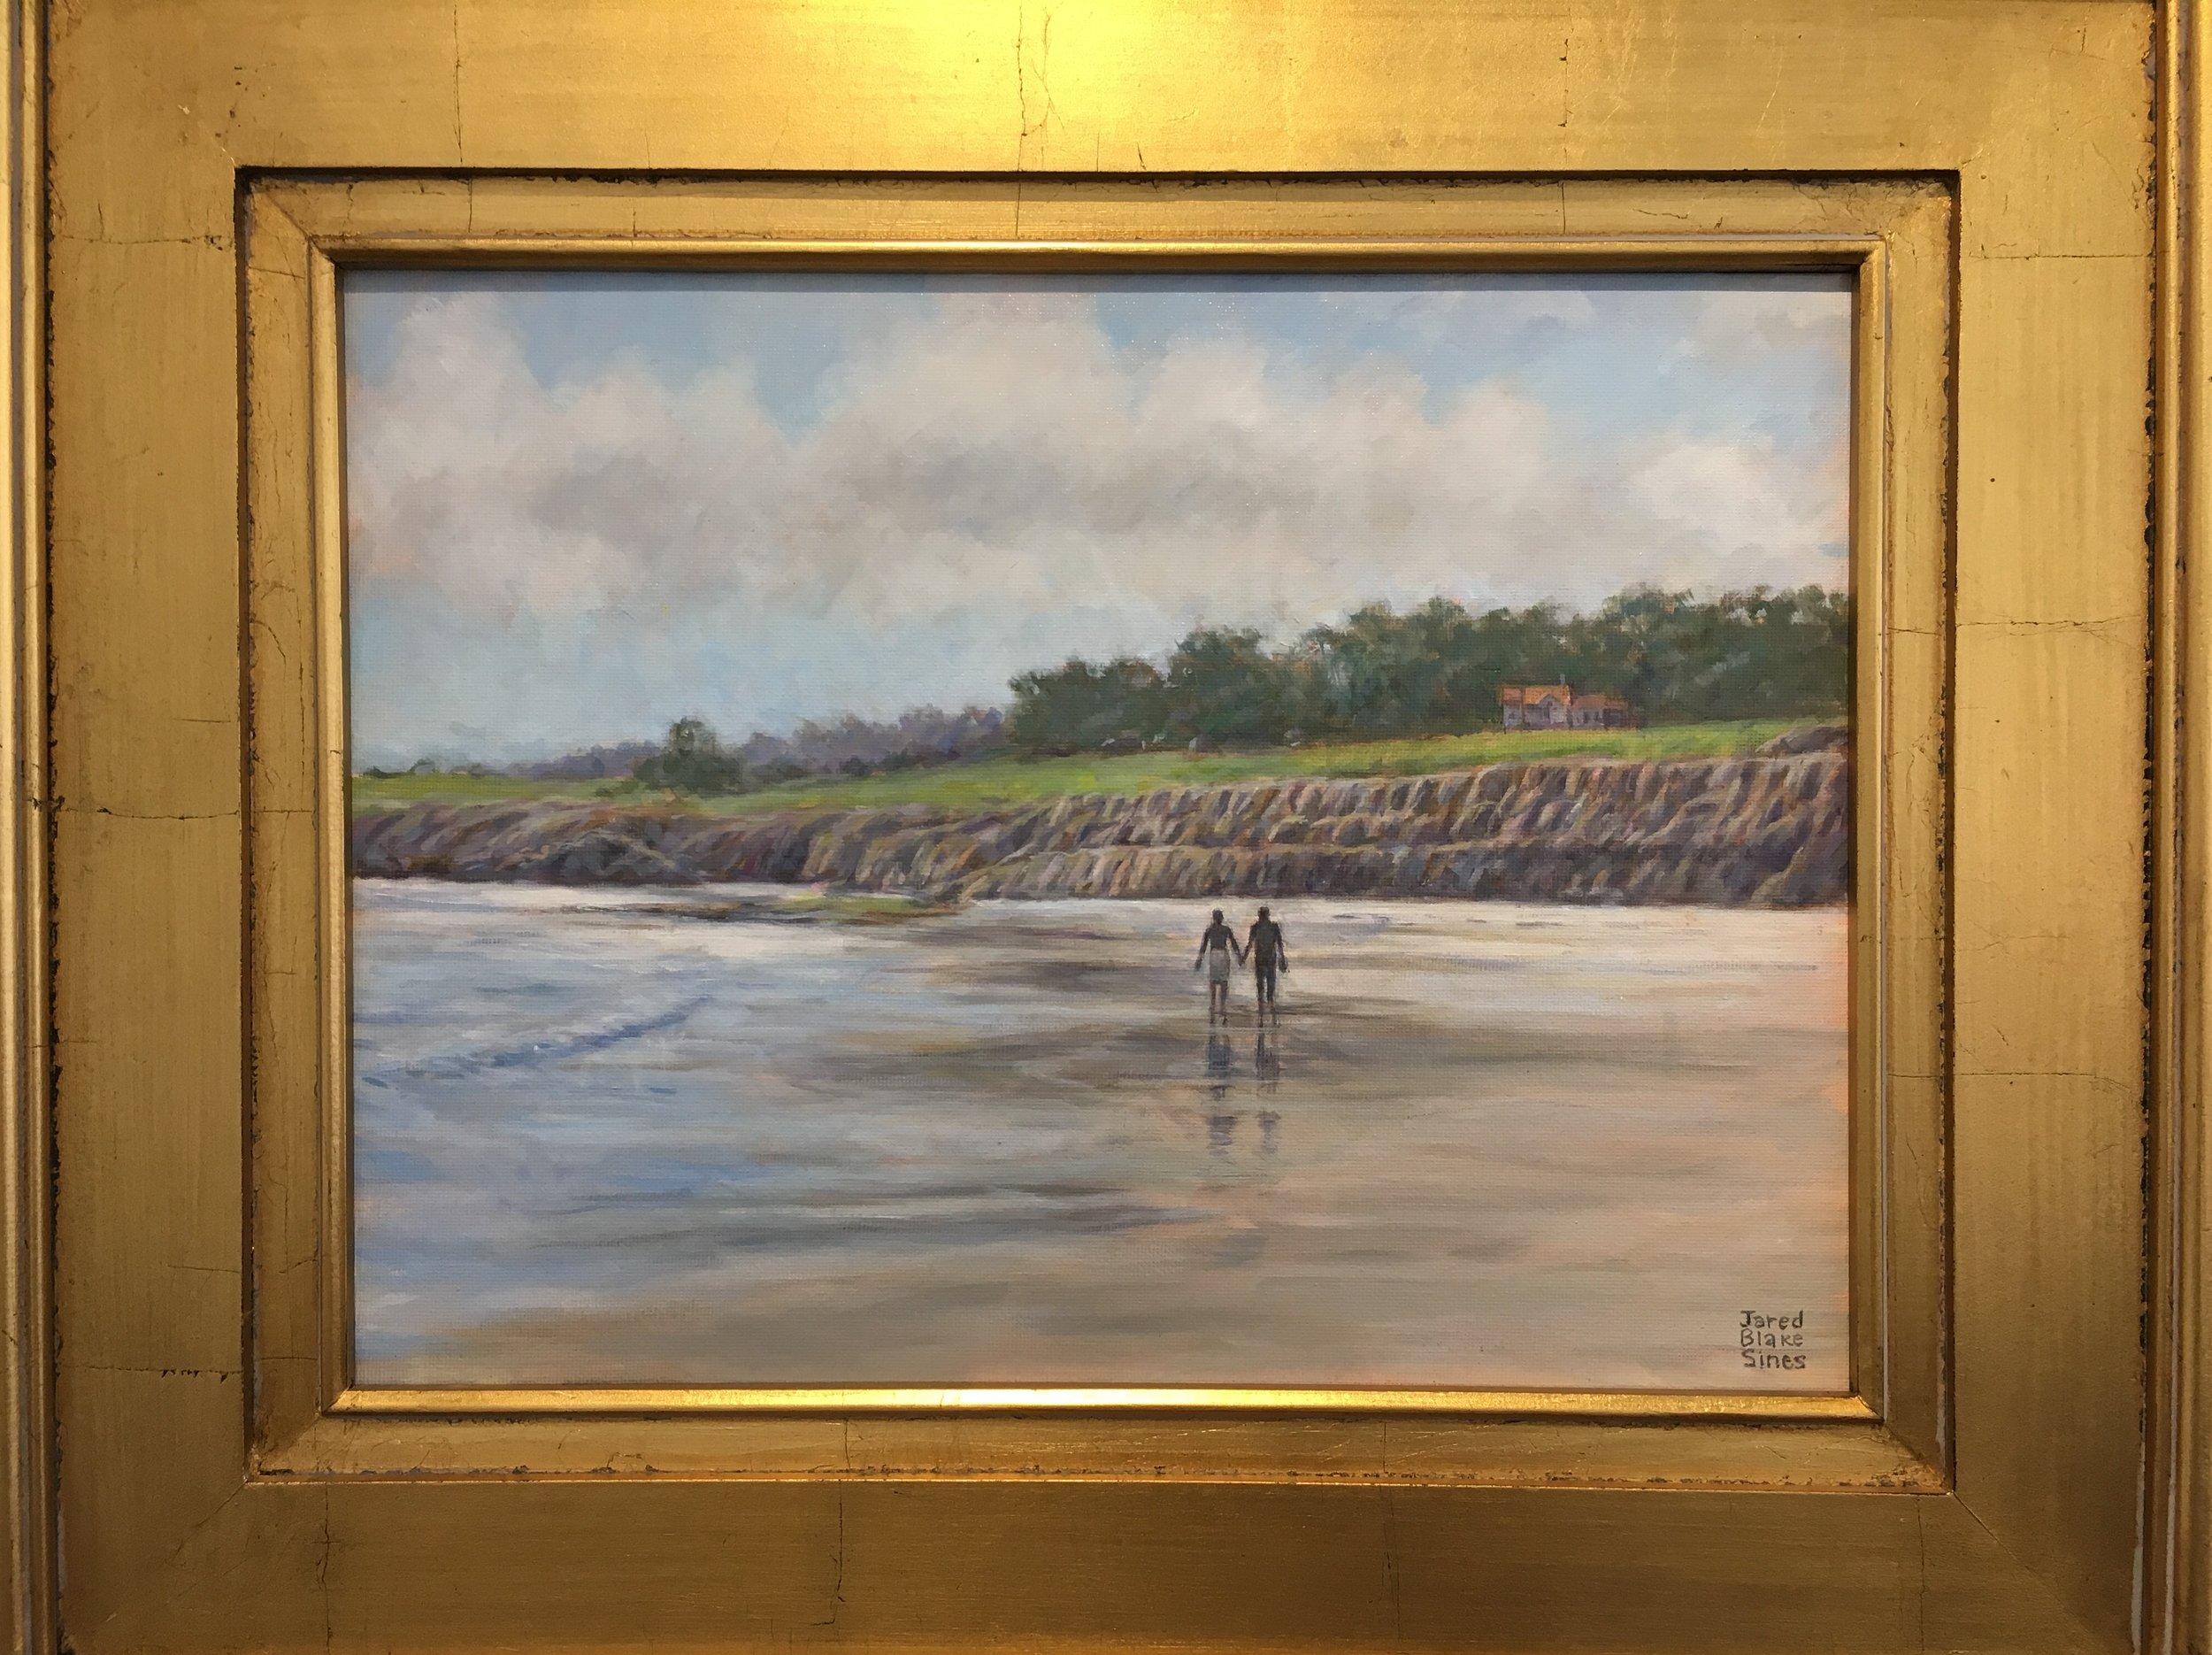 HONORABLE MENTION  - Jarred Sines | Walking on Ocean Beach | Oil on Canvas